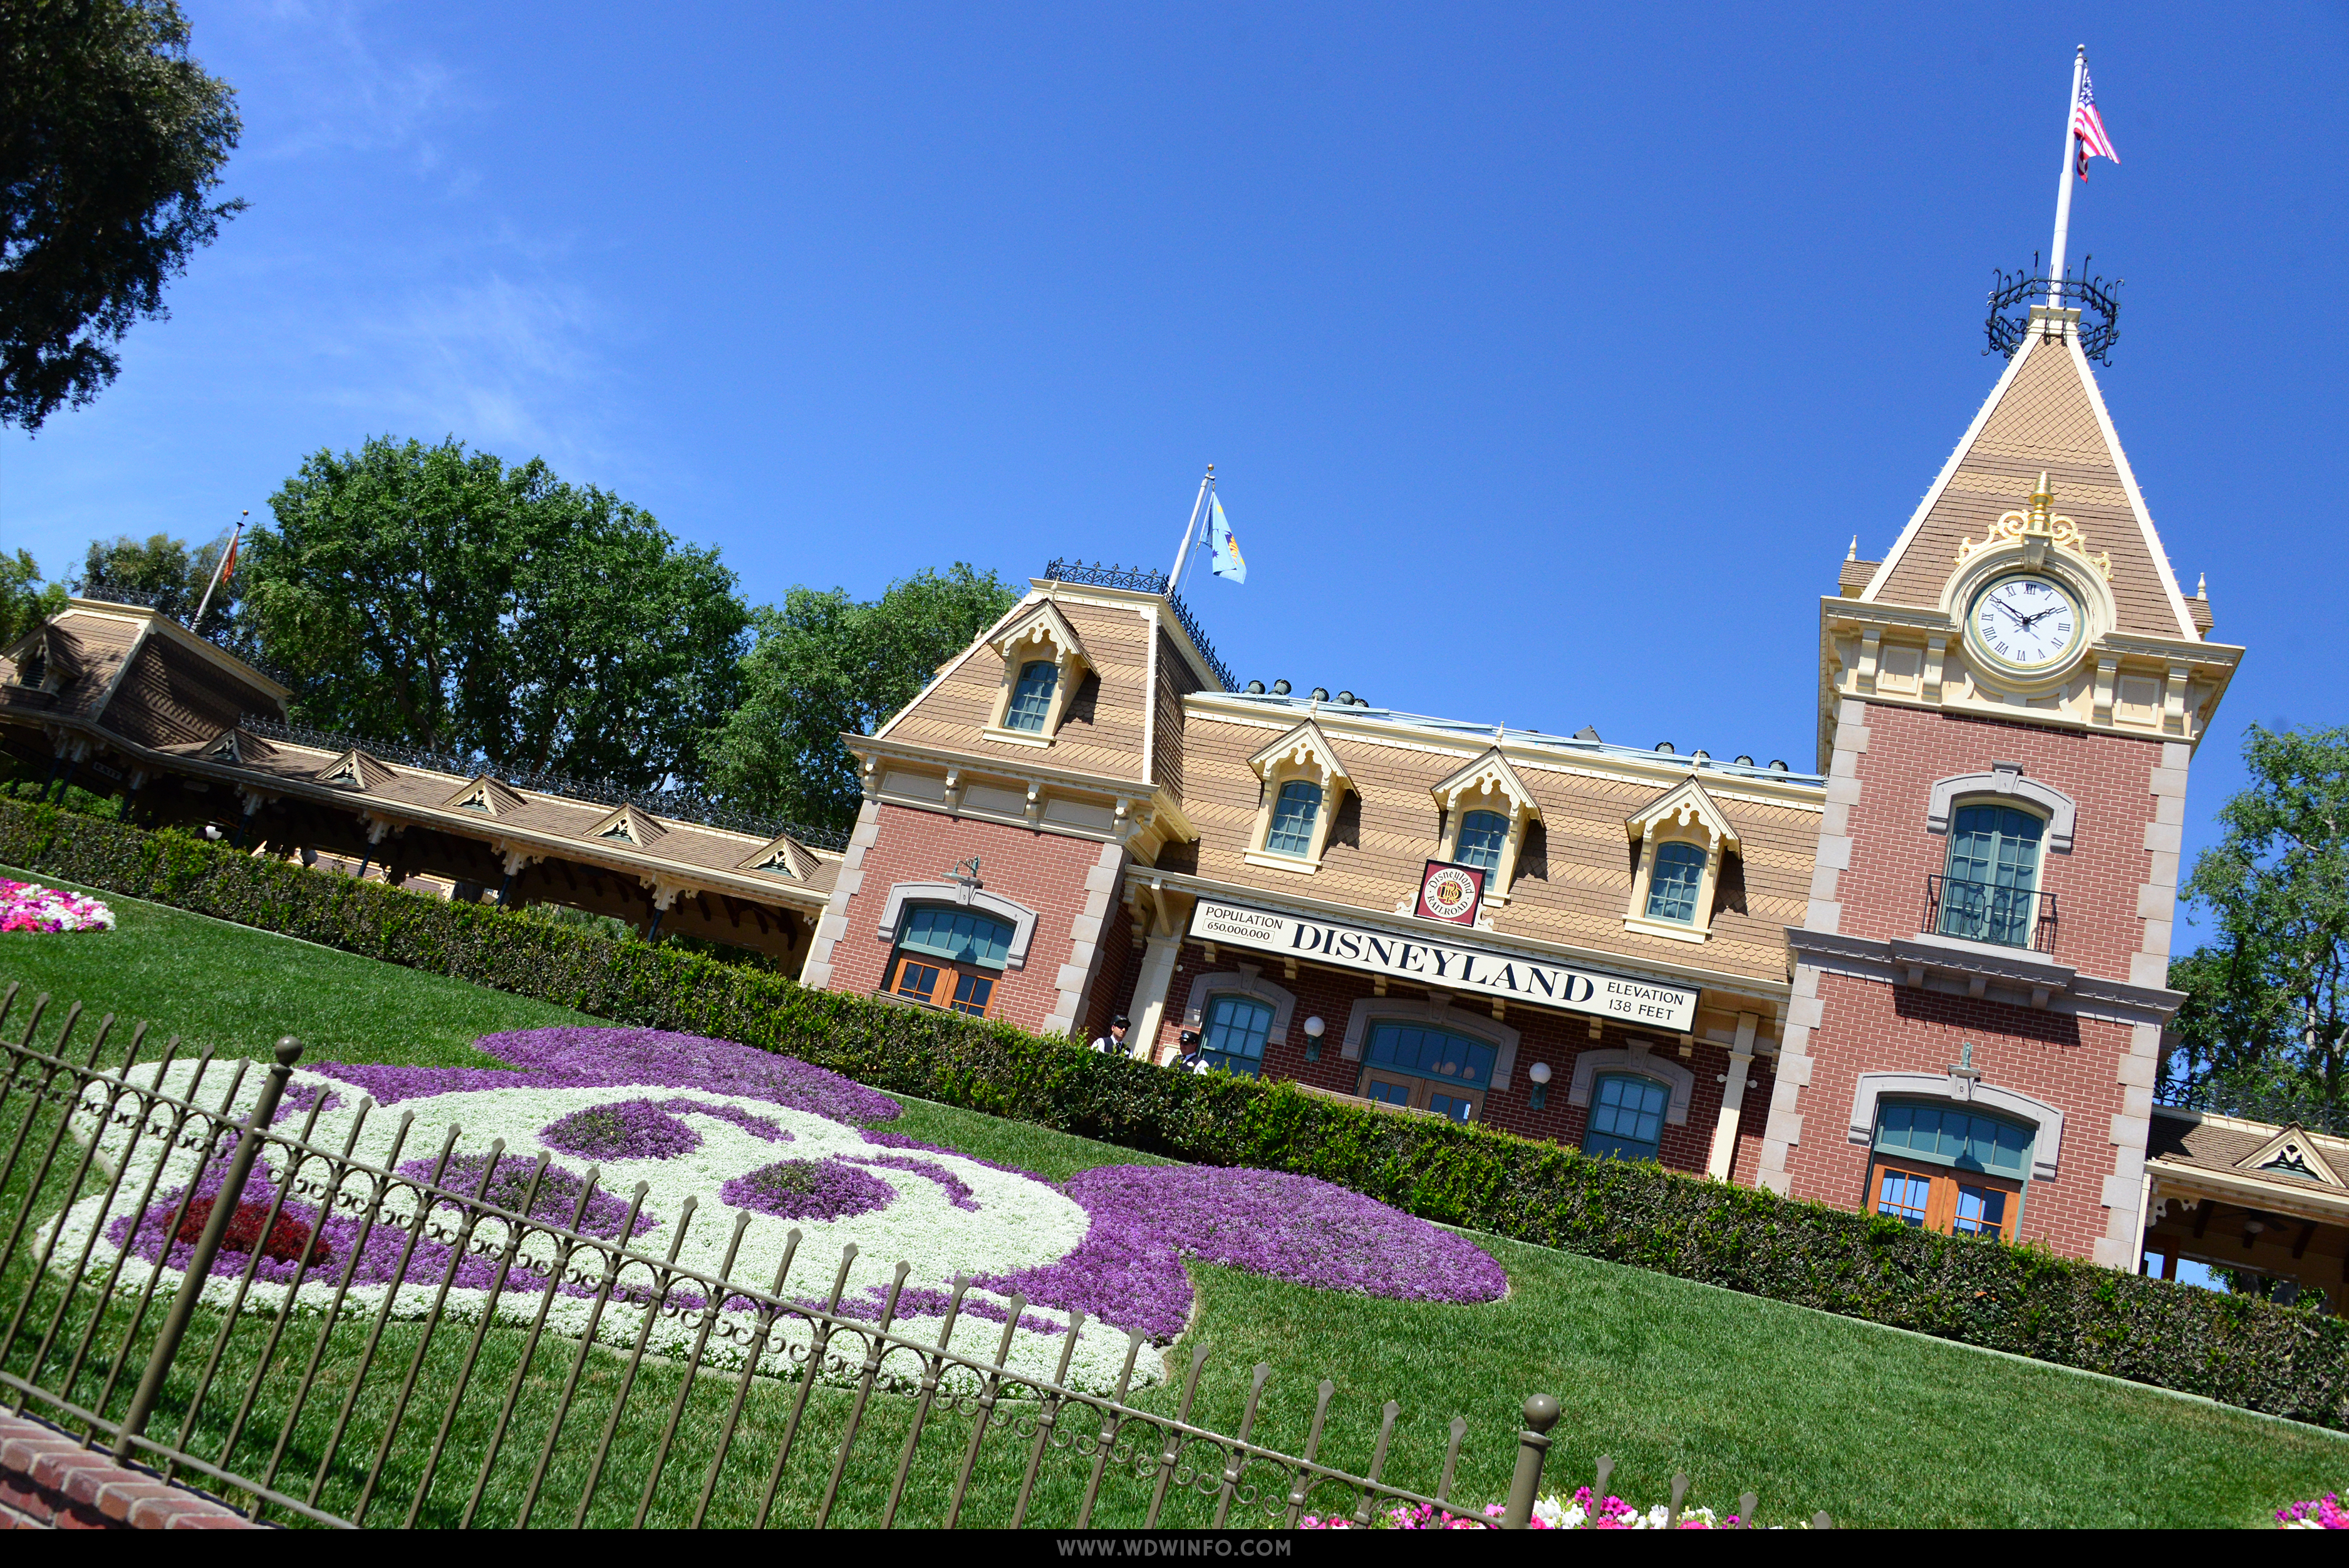 disneyland-maingate Disneyland Maingate Hotels Map on disneyland hotel, disneyland main entrance, disneyland orlando, disneyland at halloween time, disneyland marquee,